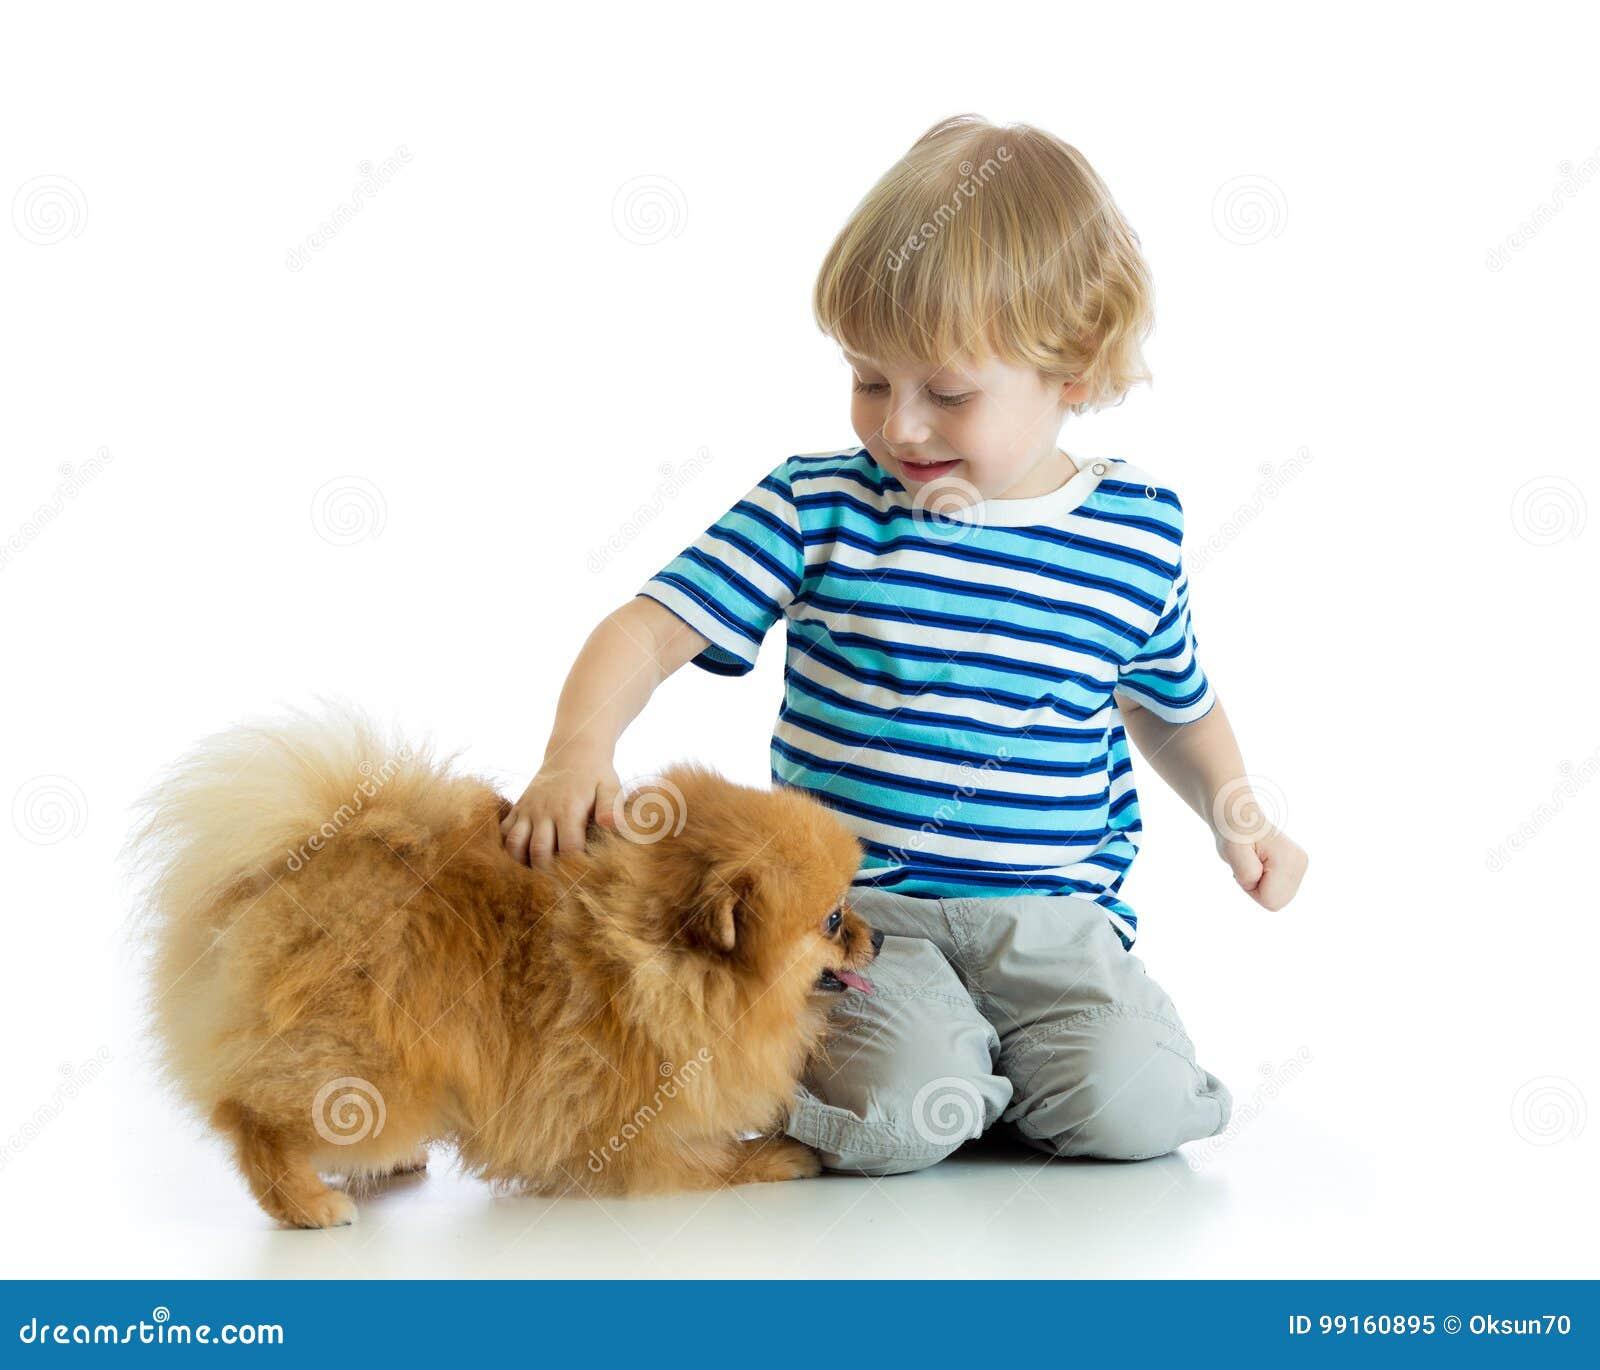 Little boy with dog spitz, isolated on white background